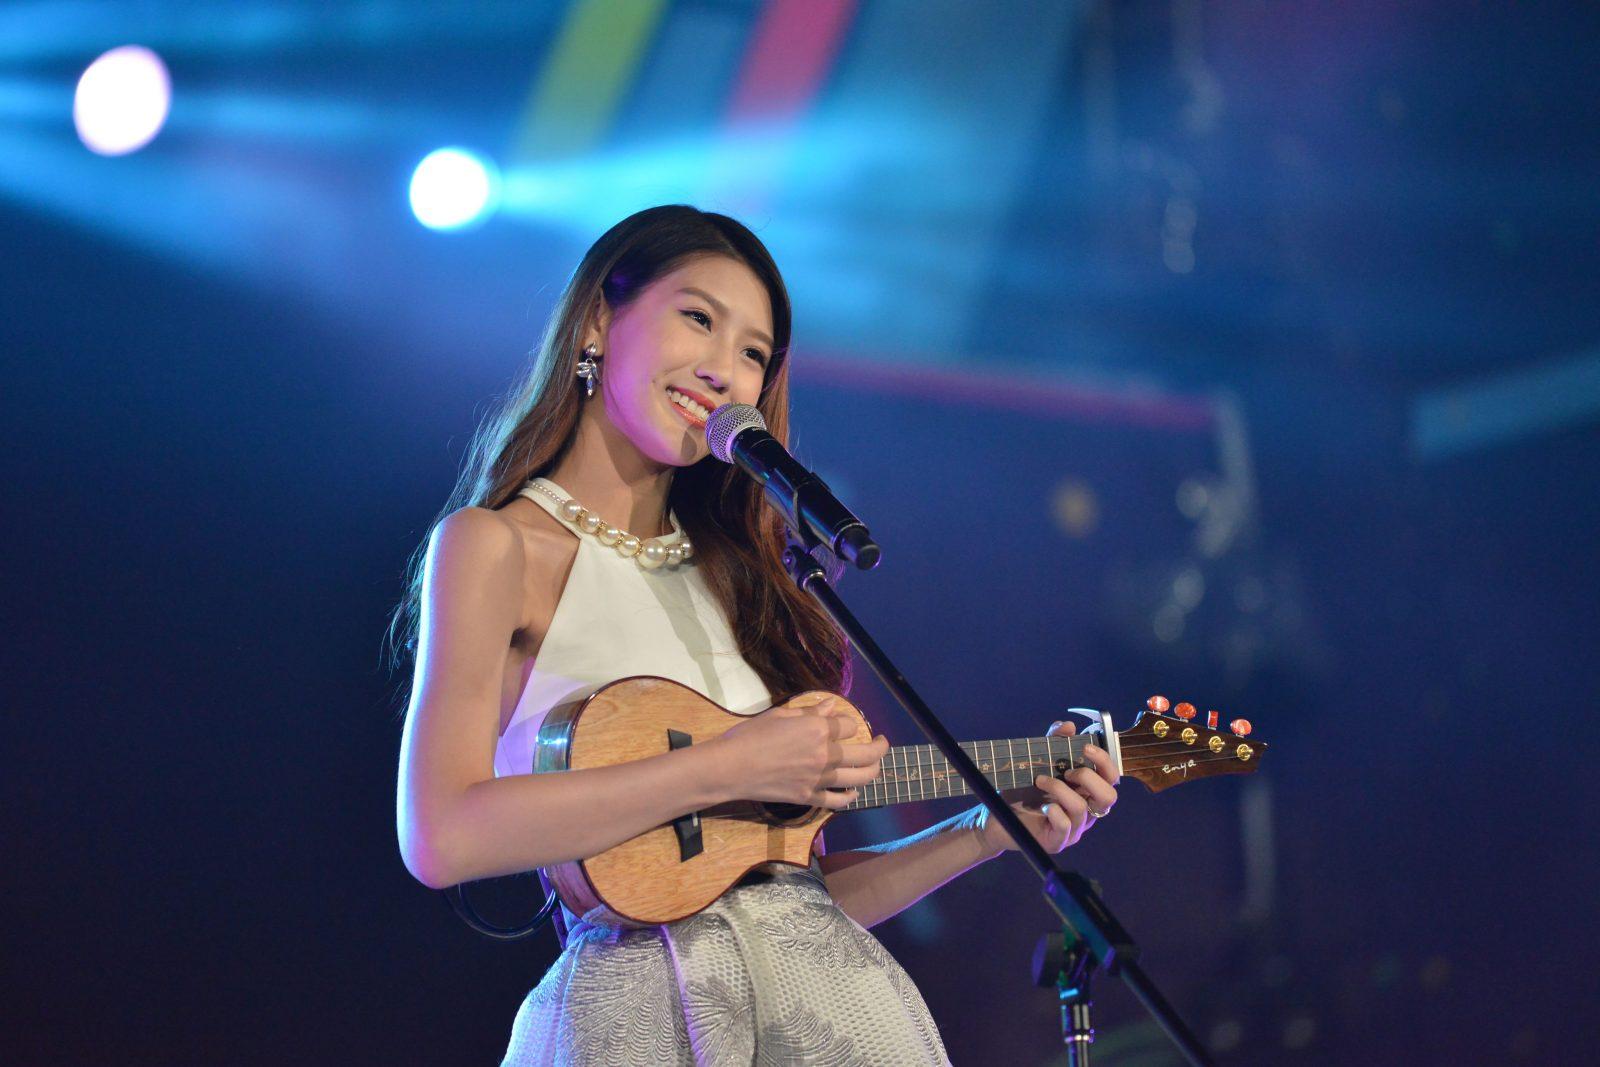 Joyce Chu Malaysia Chabor Namewee WebTVAsia Content Creators Video Stars